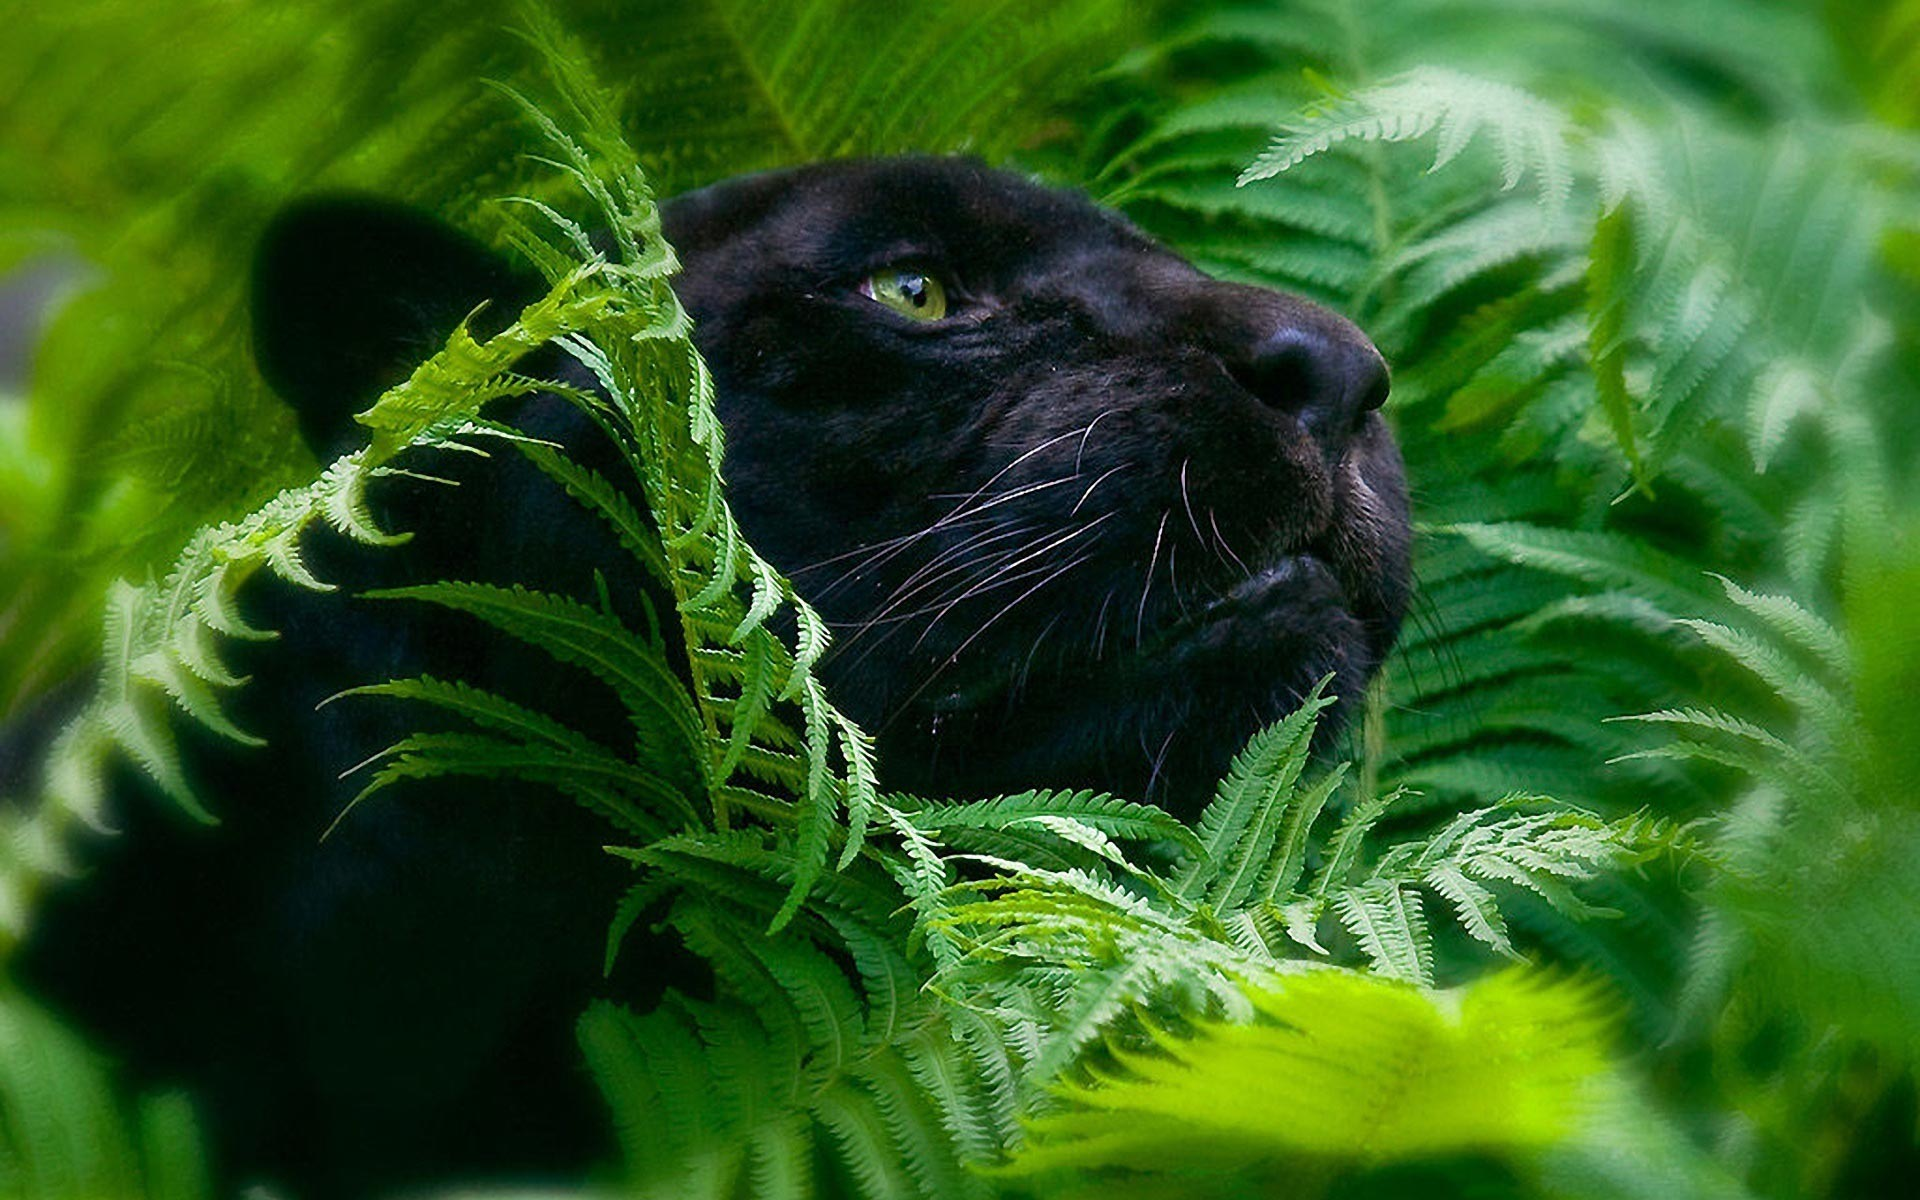 Black Panther HD Wallpaper Download HD Wallpapers for Desktop 1920x1200